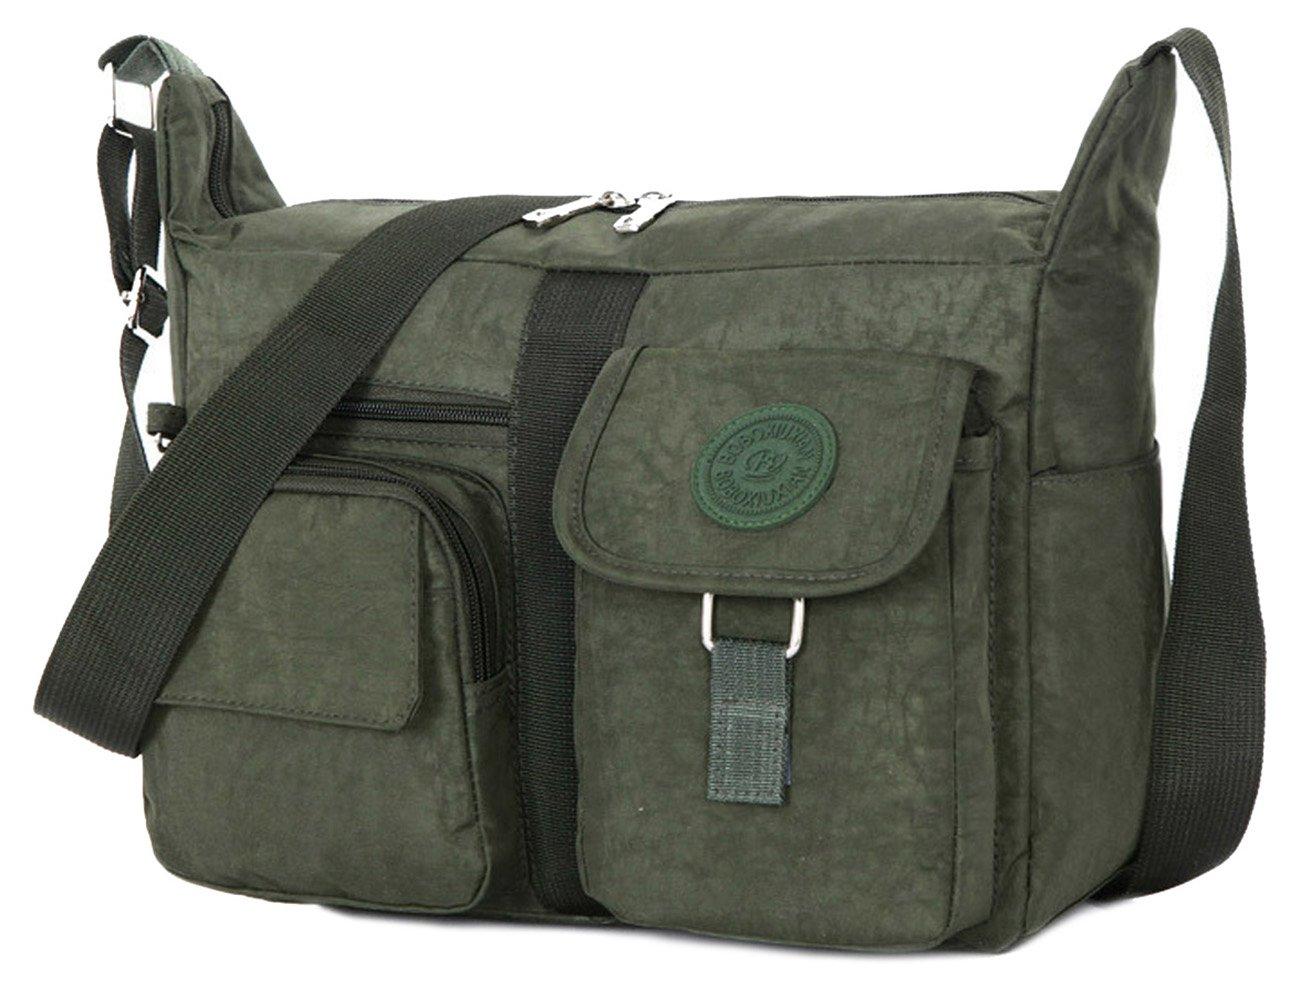 TIBES Travel Messenger Bag Casual Shoulder Bag Couple's Design Oxford Fabric Crossbody Bag for Men/Women Army Green